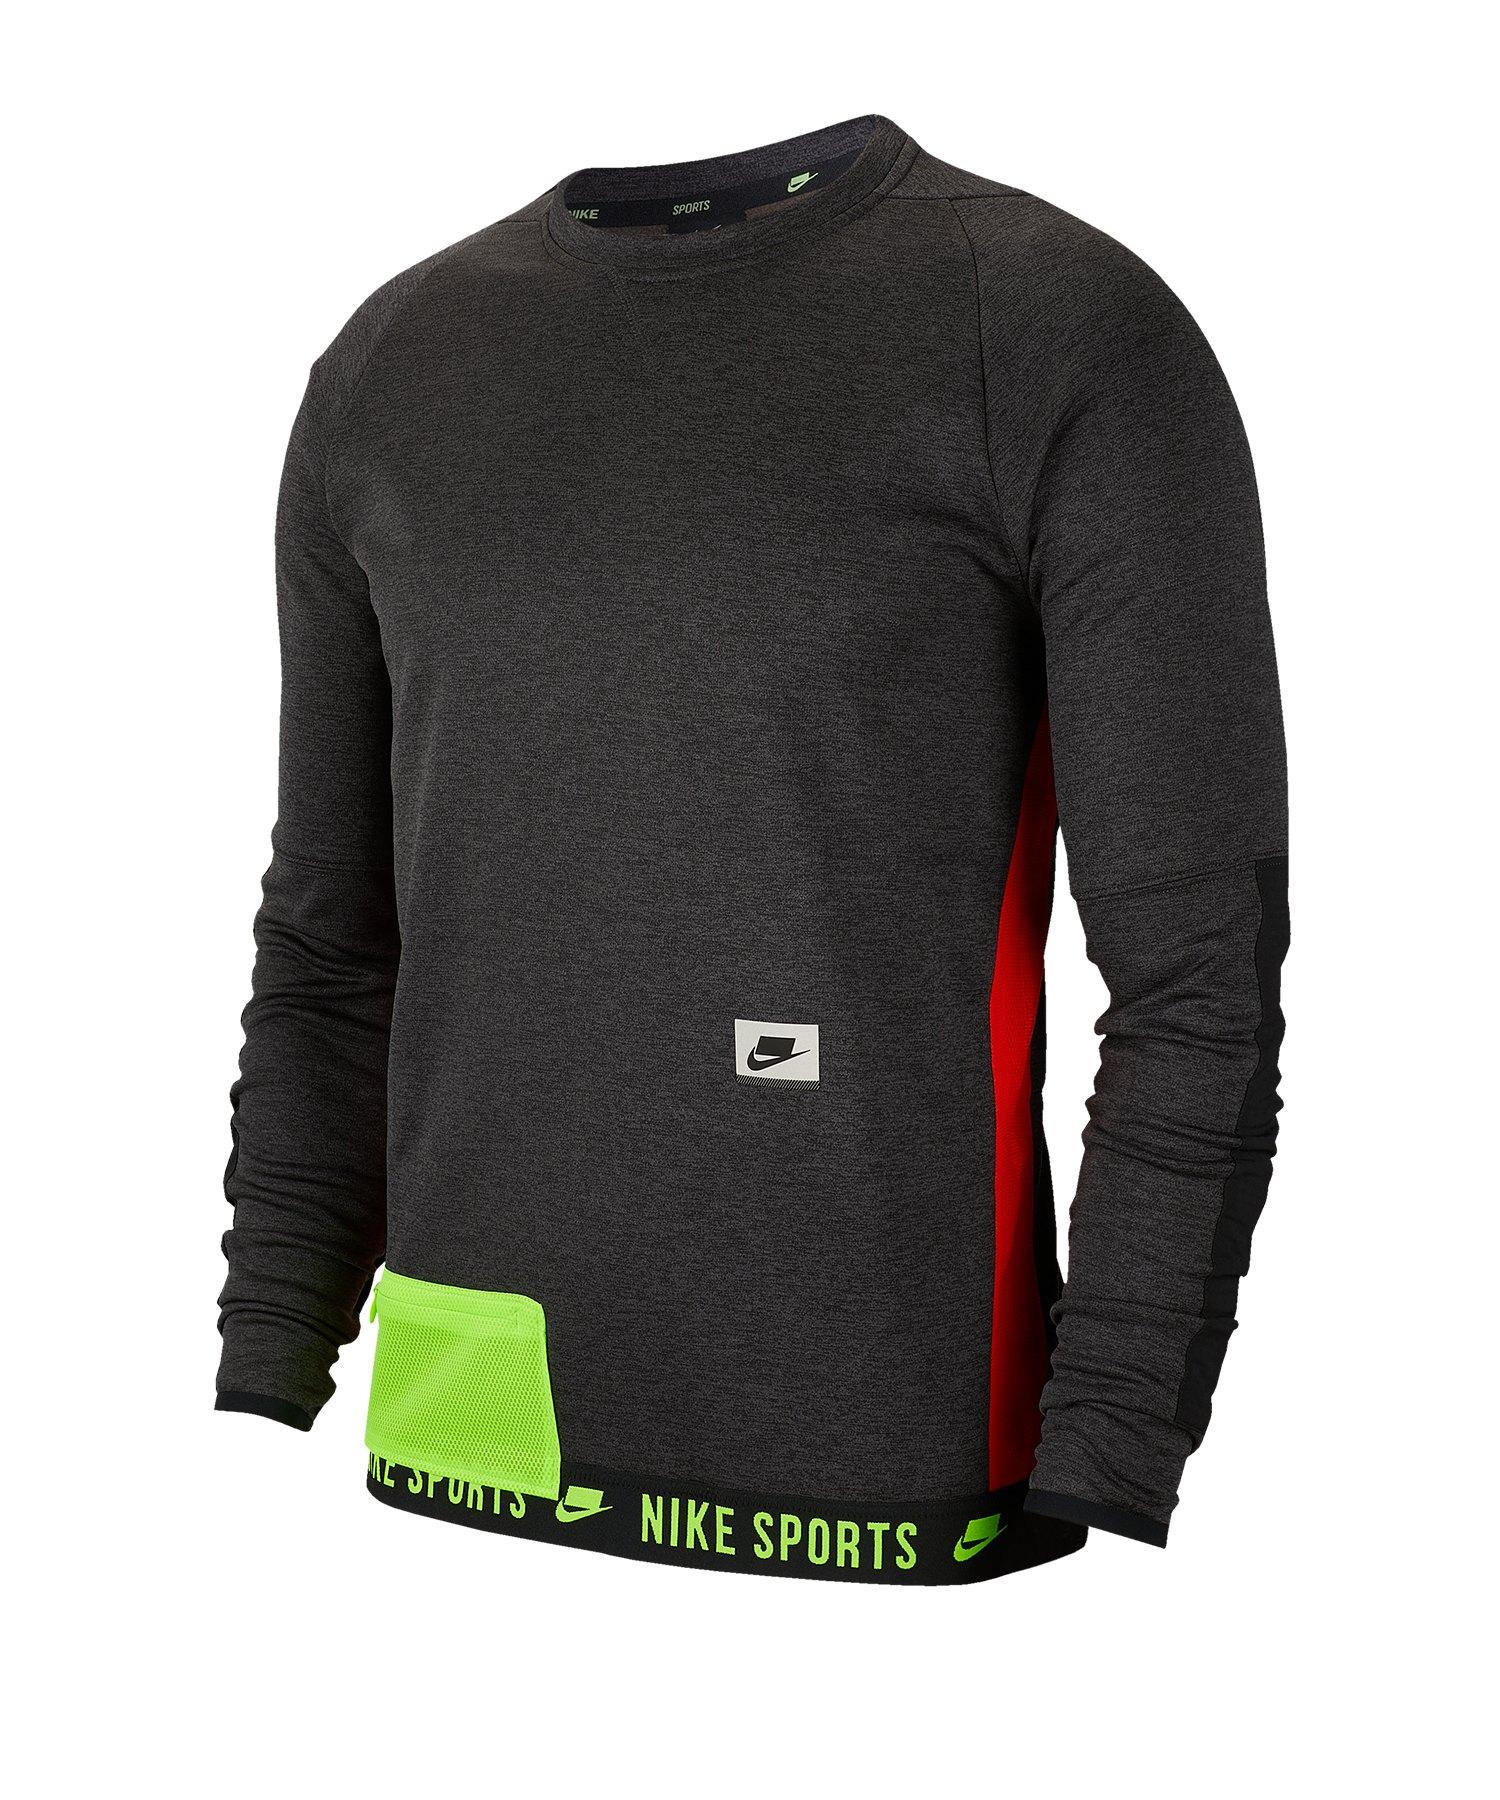 Nike Dri-FIT Therma Trainingsshirt langarm F010 - schwarz